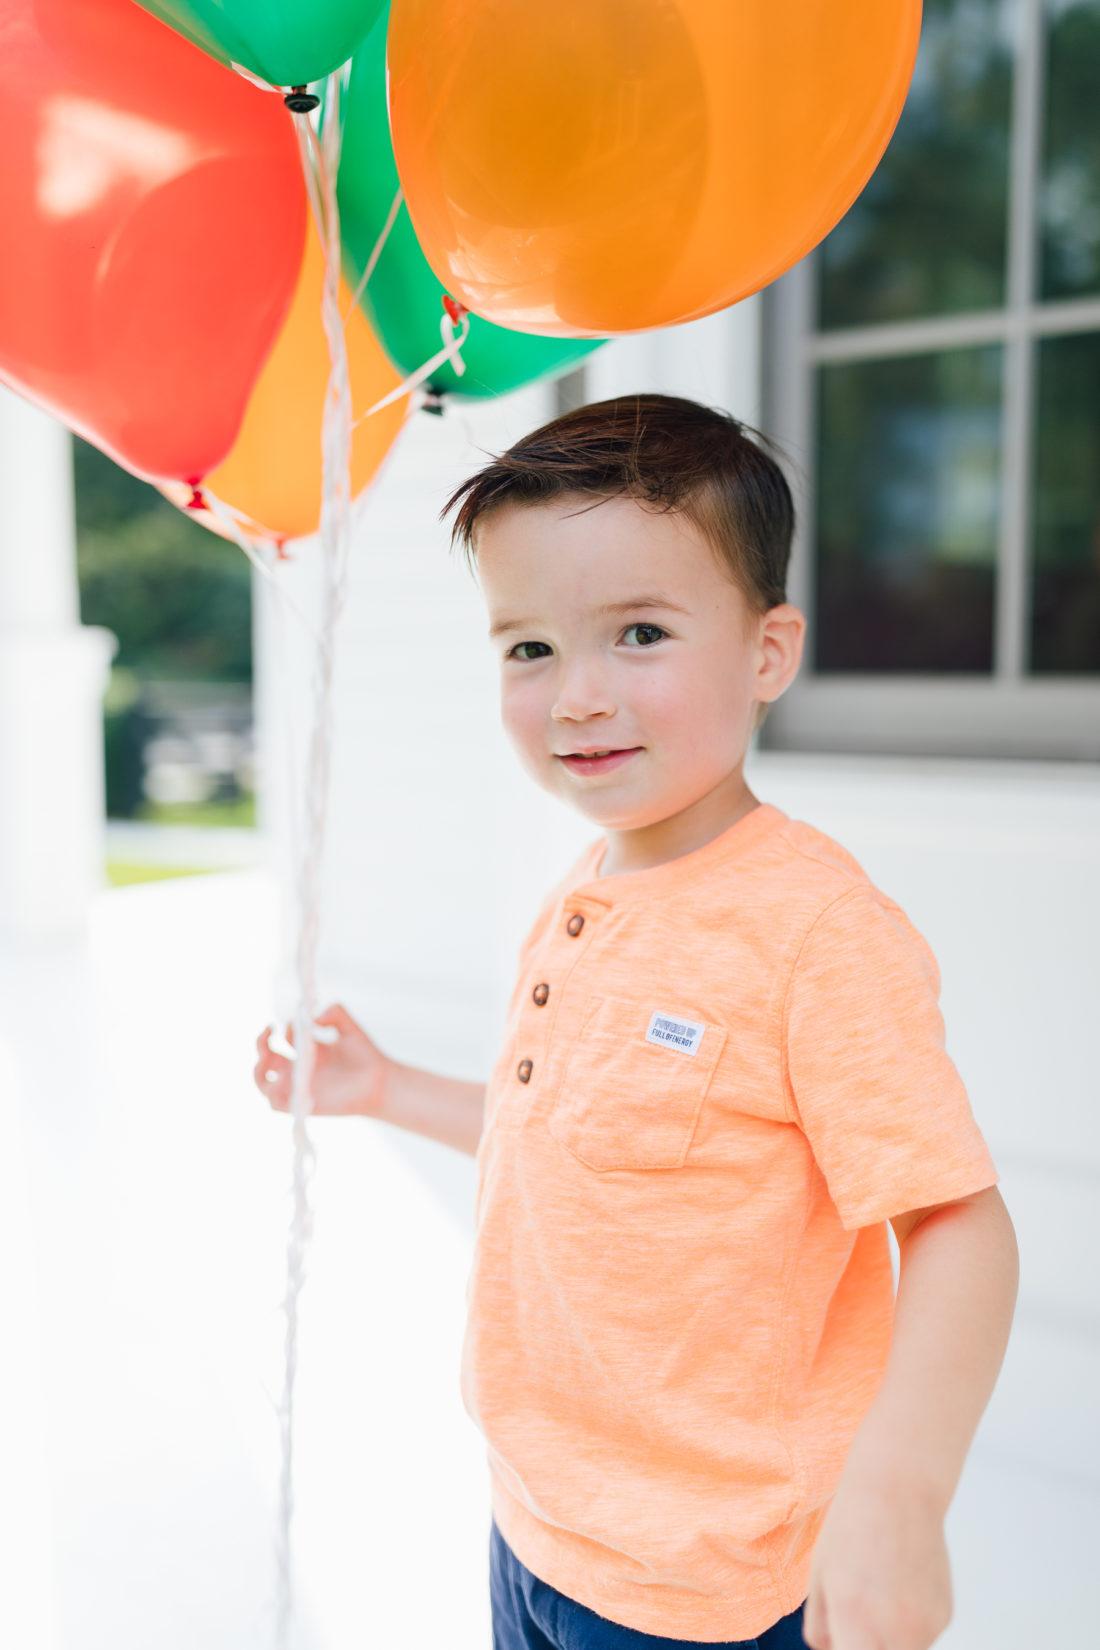 Eva Amurri Martino's son Major turns 3